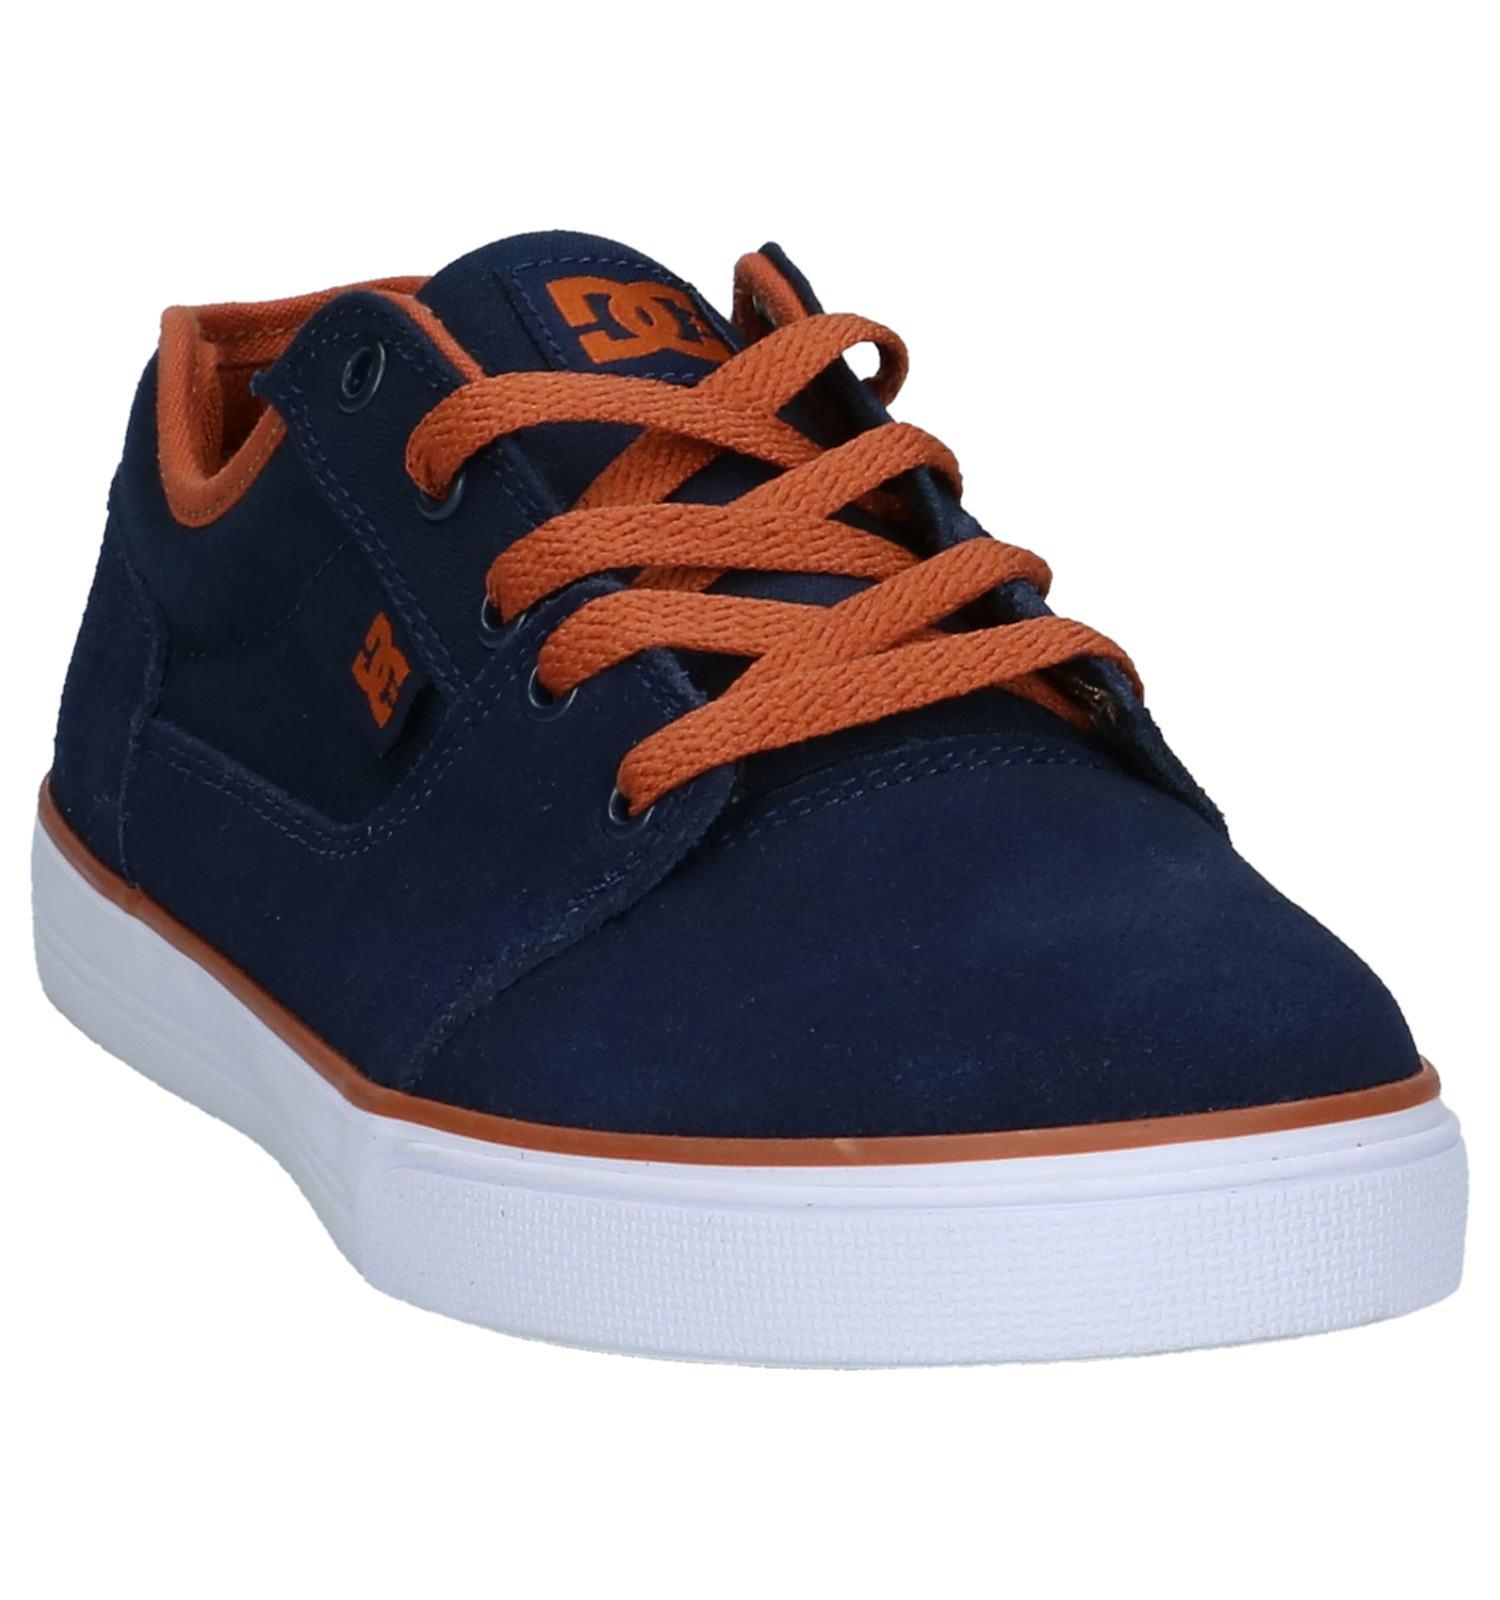 Tonik Dc Skate be Donkerblauw Lage Gratis Shoes Schoenen Torfs wSBnqOxtXR